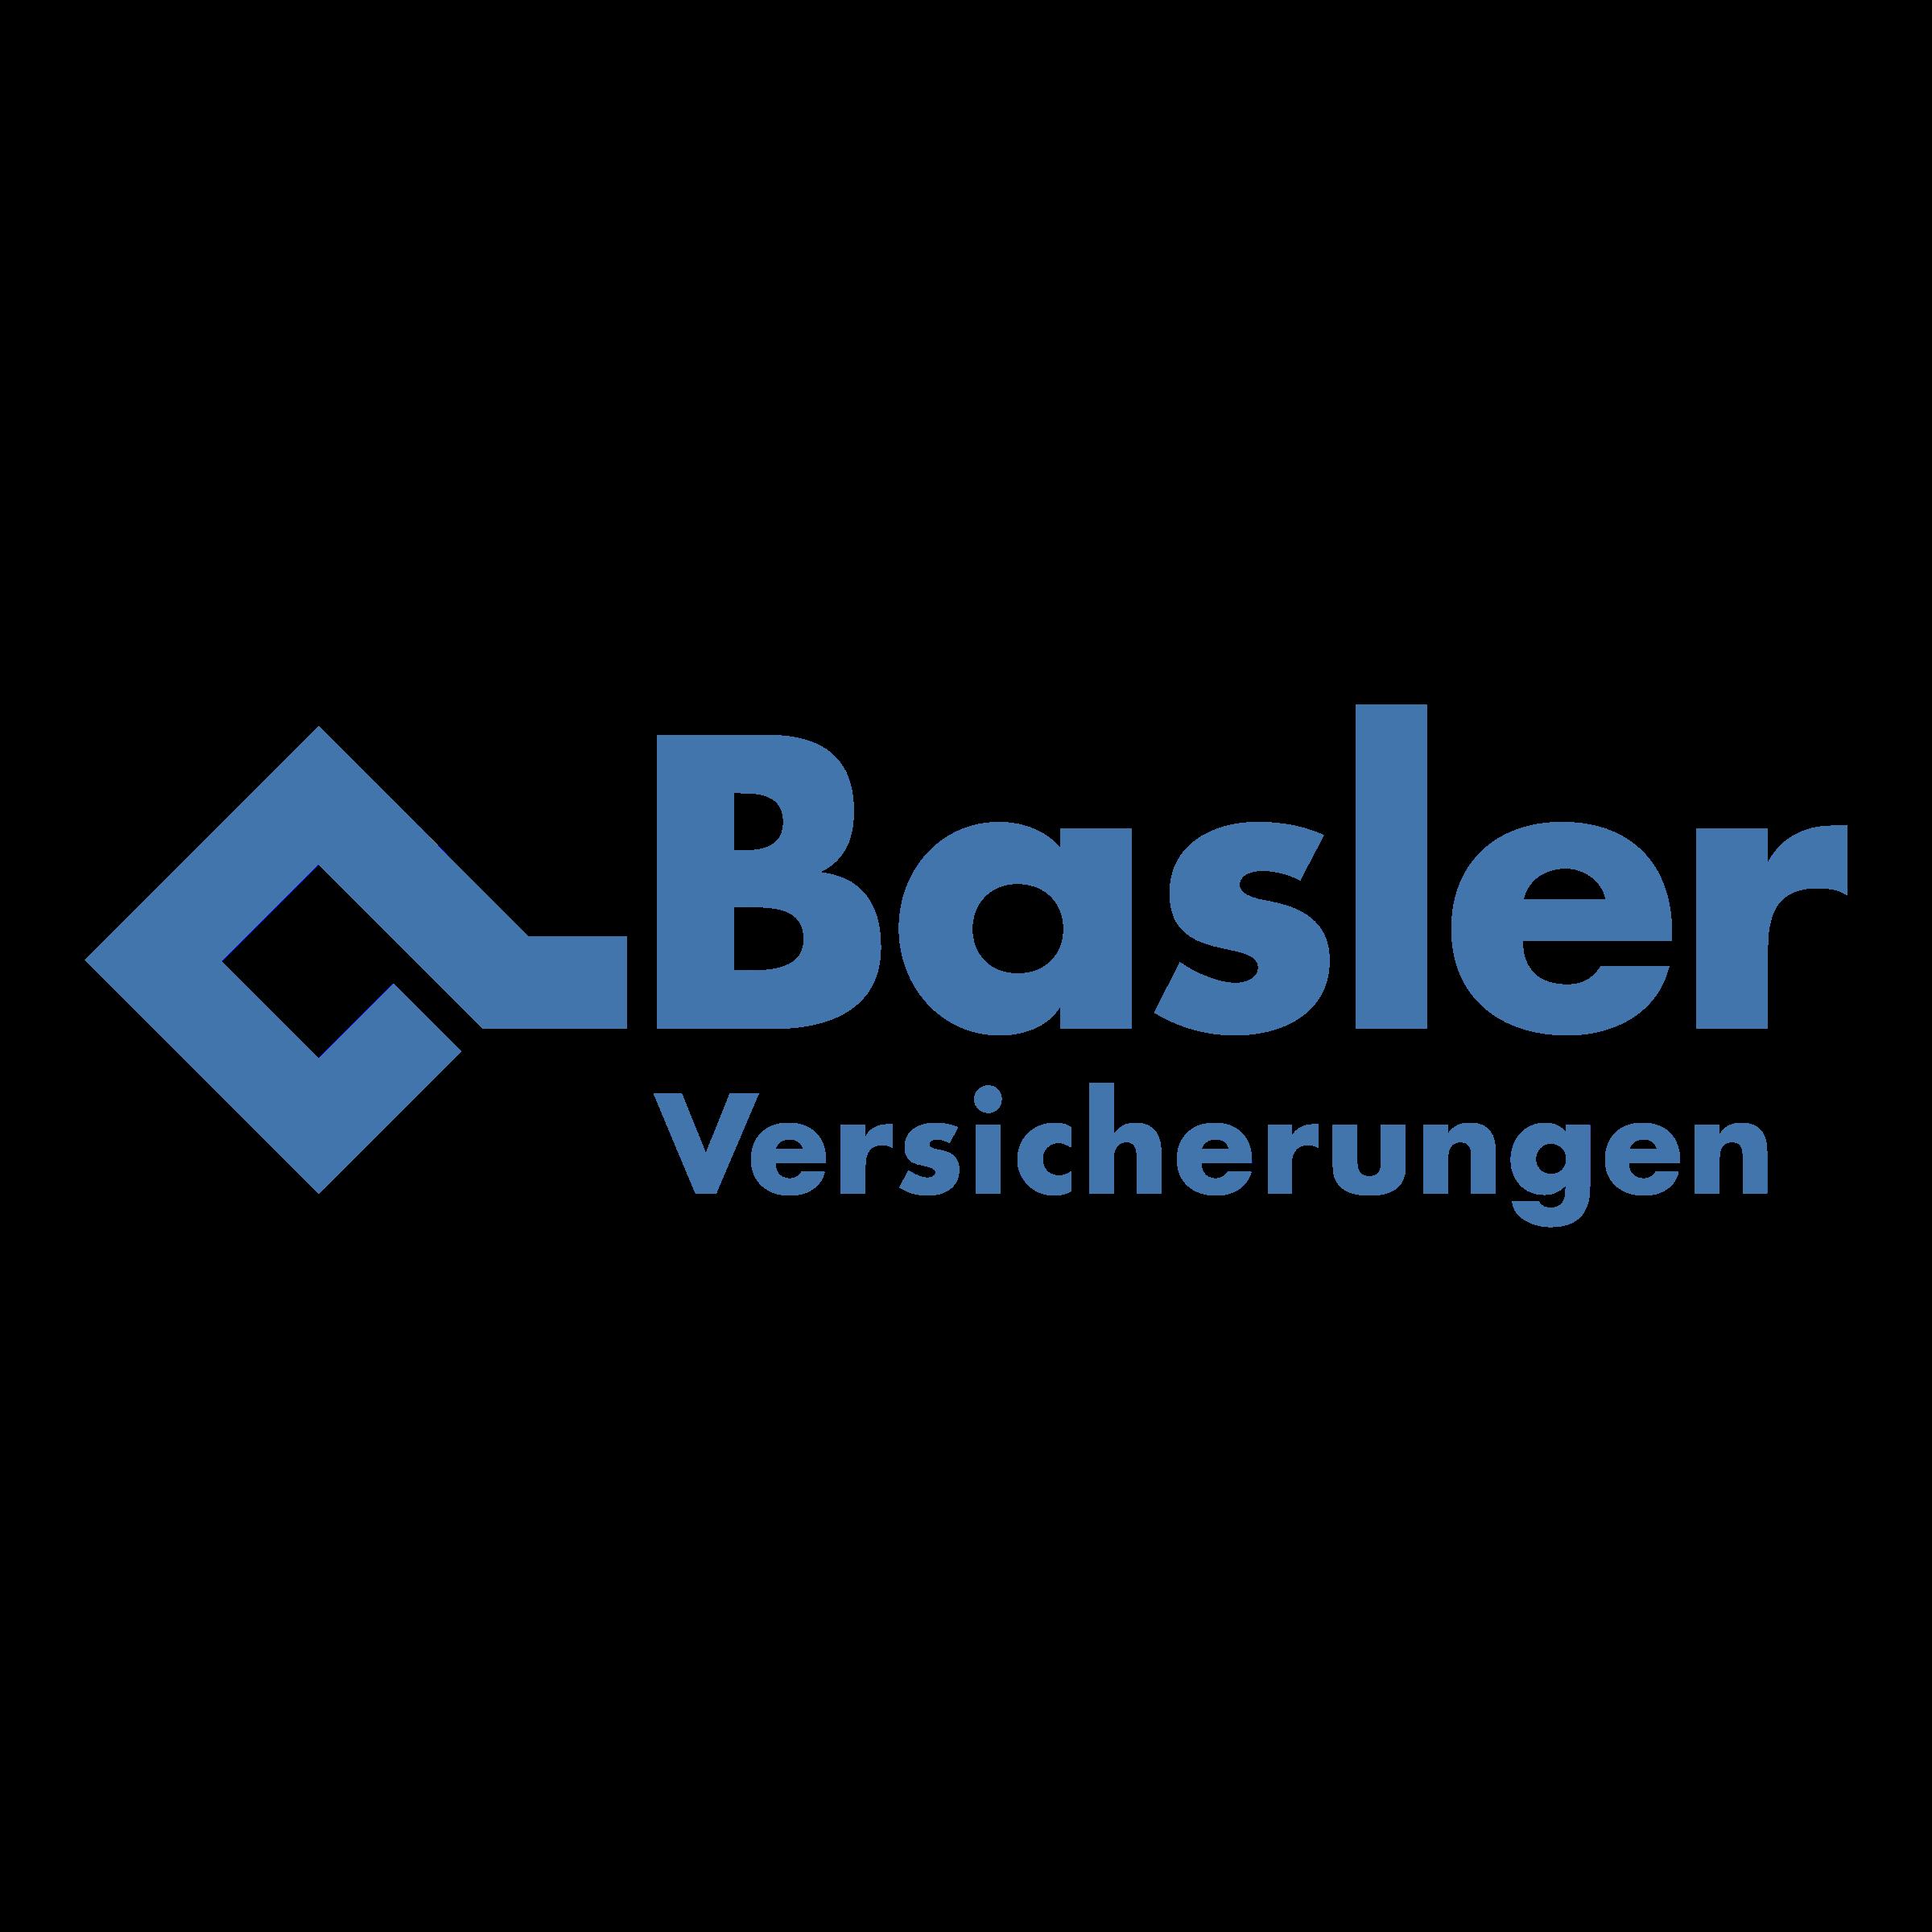 Basler Versicherungen Logo Png Transparent Svg Vector Freebie Supply